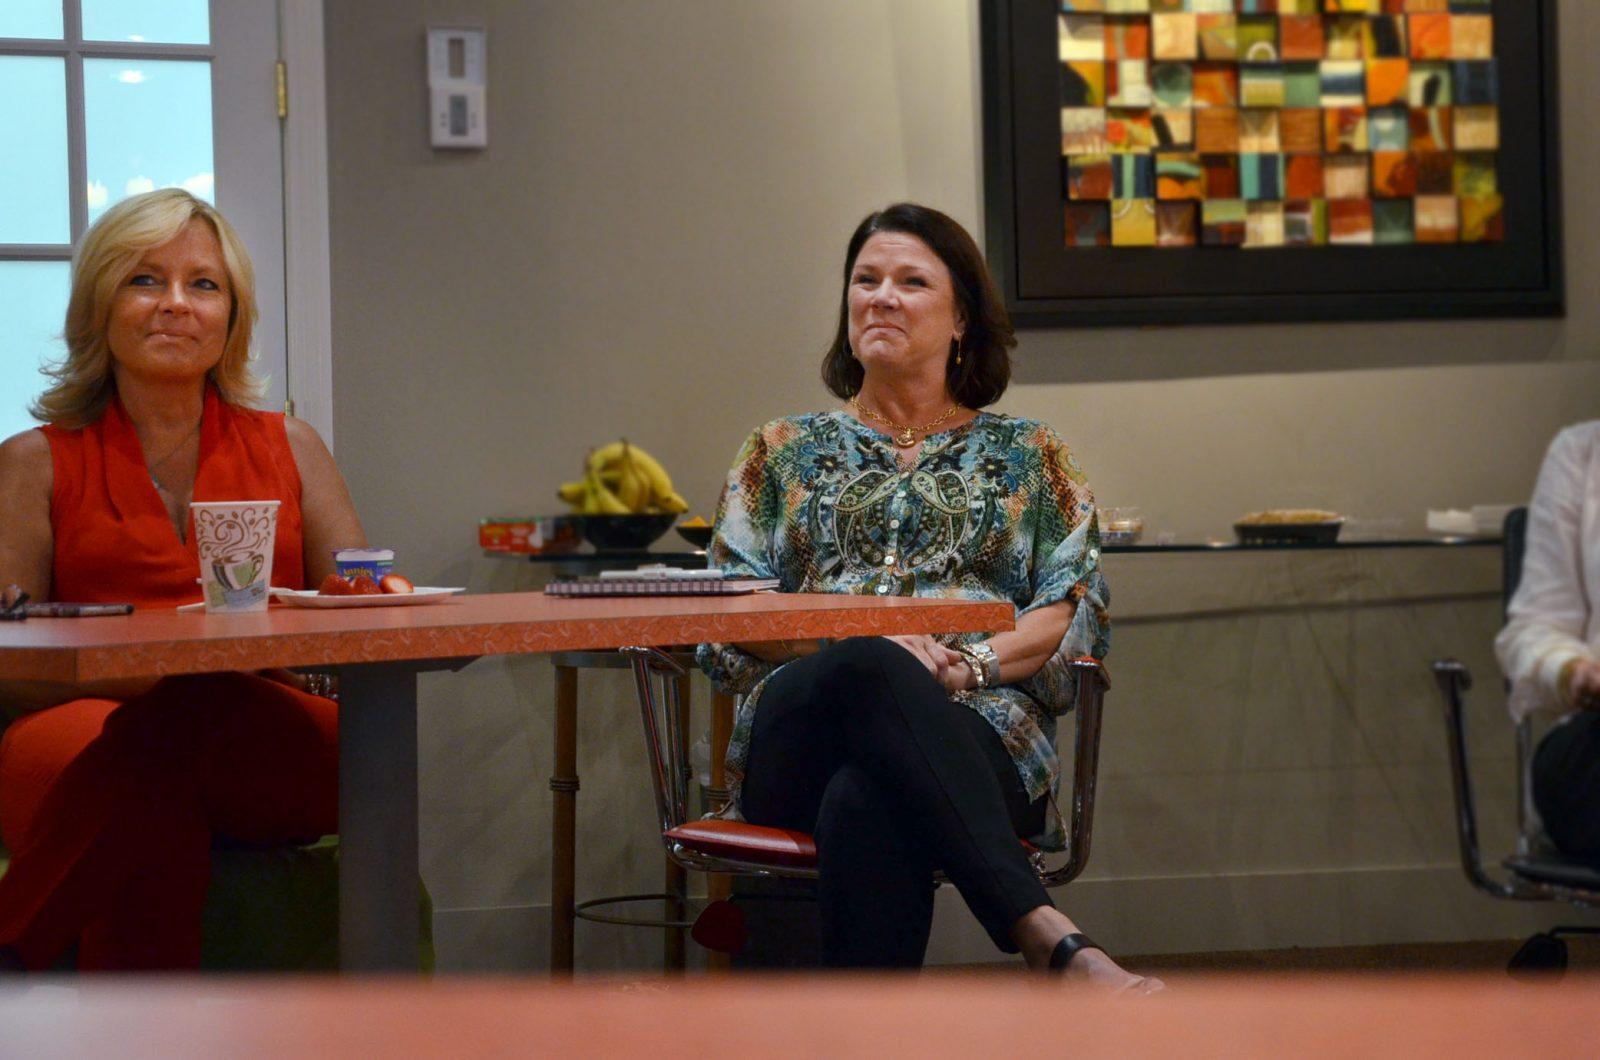 Realtors Sheri Putman, left, and Lisa Albertson listen to the discussion,